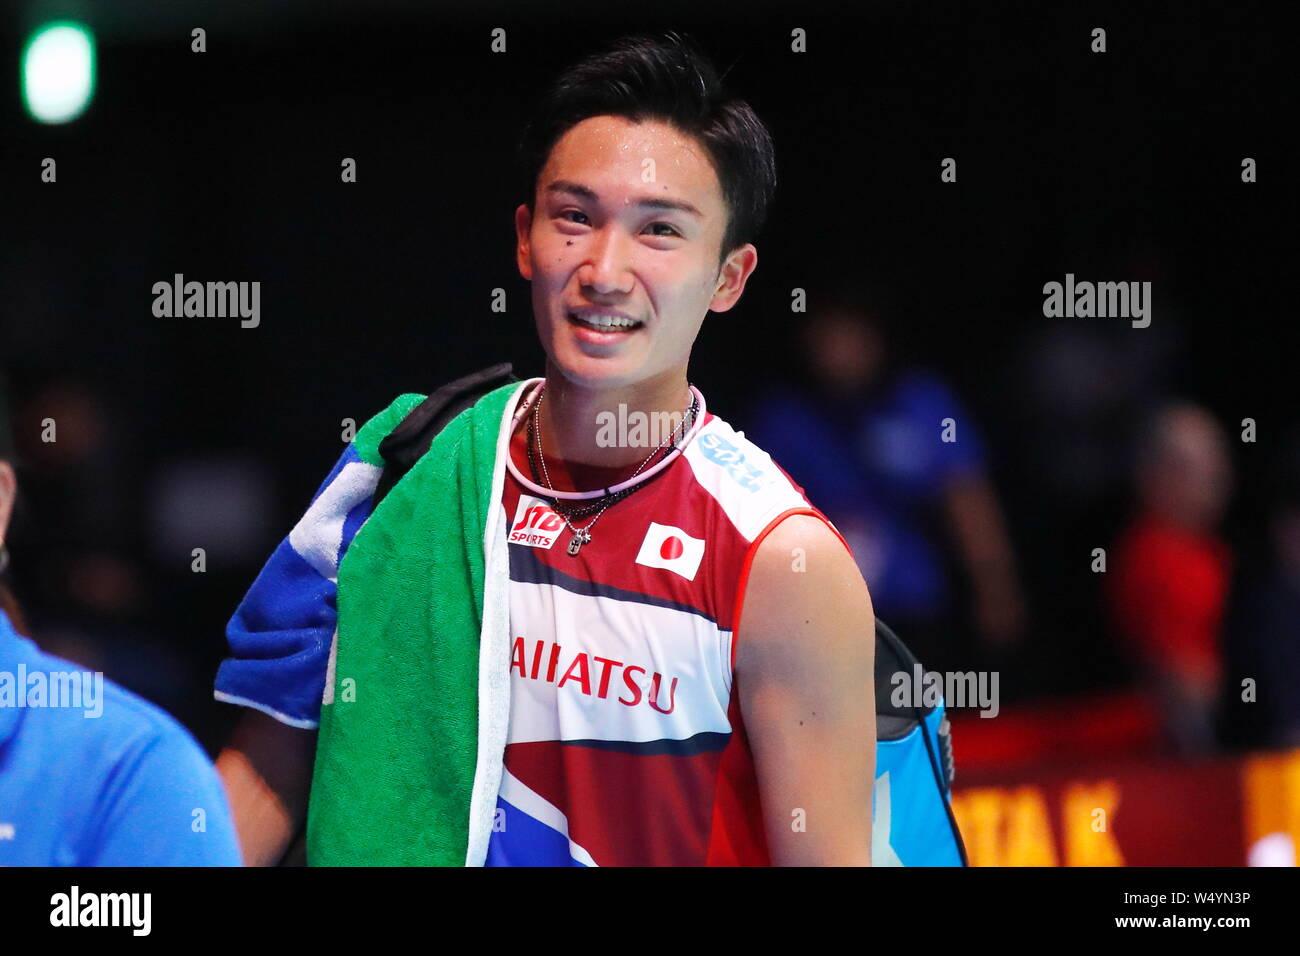 Tokyo, Japan. 23rd July, 2019. Kento Momota (JPN) Badminton : Daihatsu Yonex Japan Open 2019 men's Singles at Musashino Forest Sport Plaza in Tokyo, Japan . Credit: Sho Tamura/AFLO SPORT/Alamy Live News Stock Photo